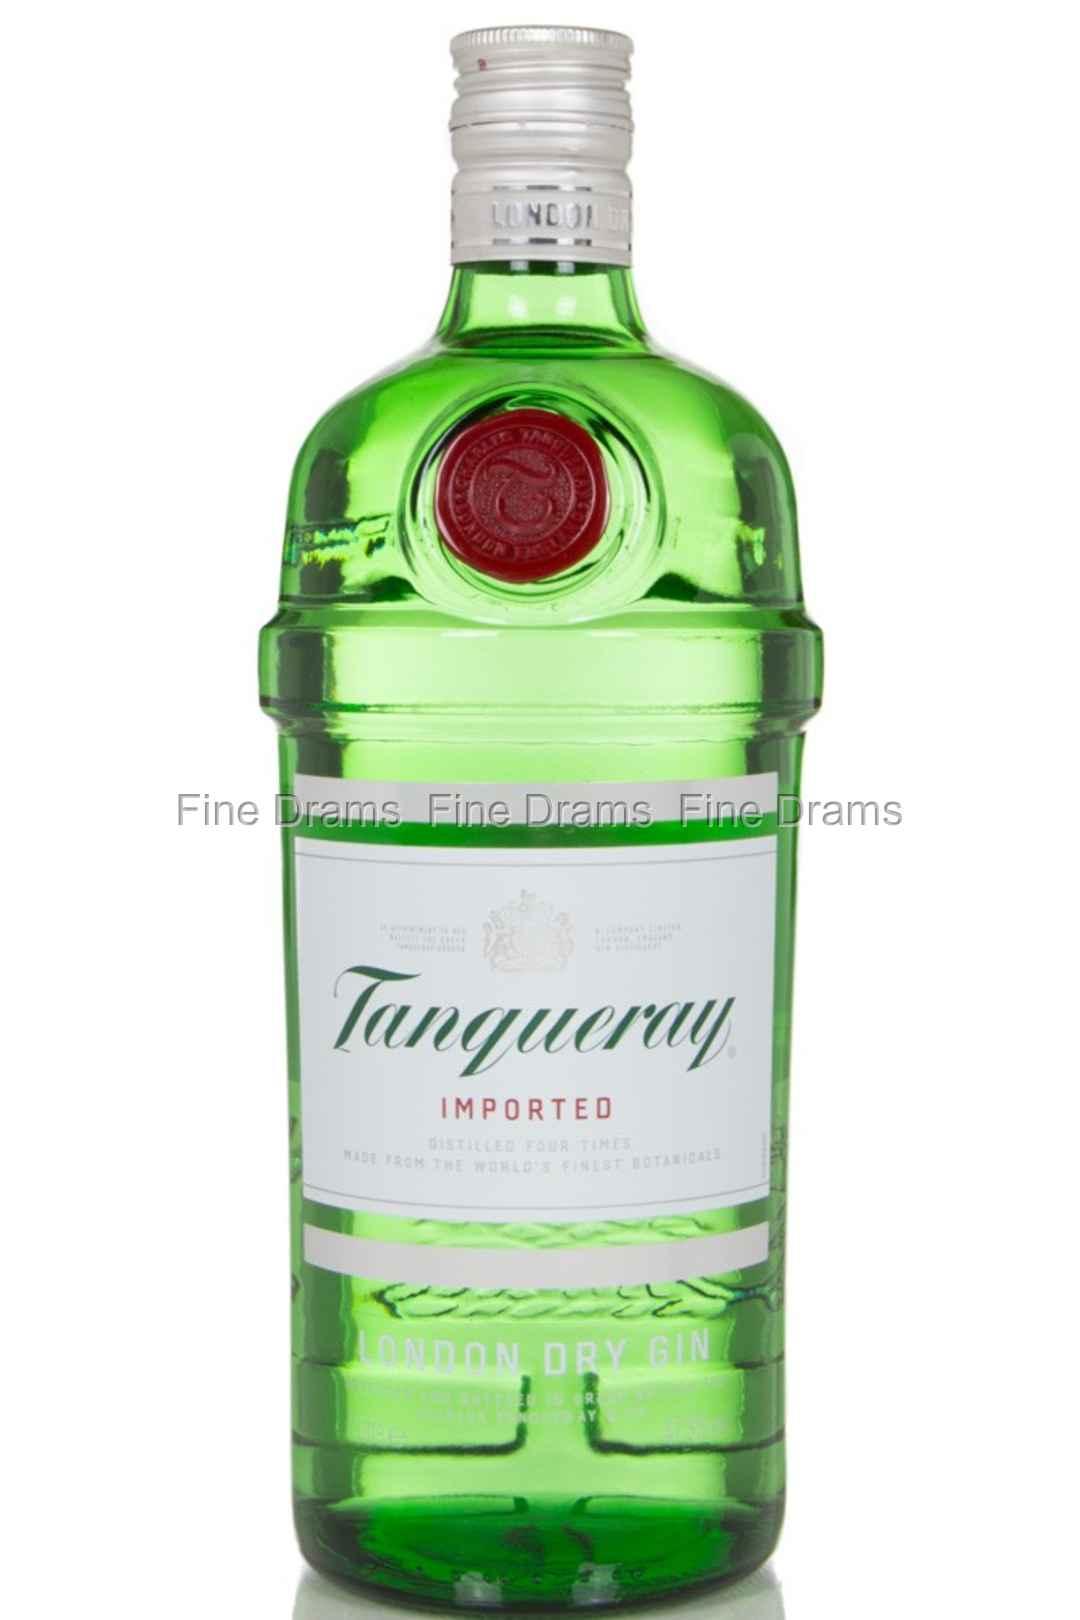 tanqueray gin 47 3 1 liter. Black Bedroom Furniture Sets. Home Design Ideas